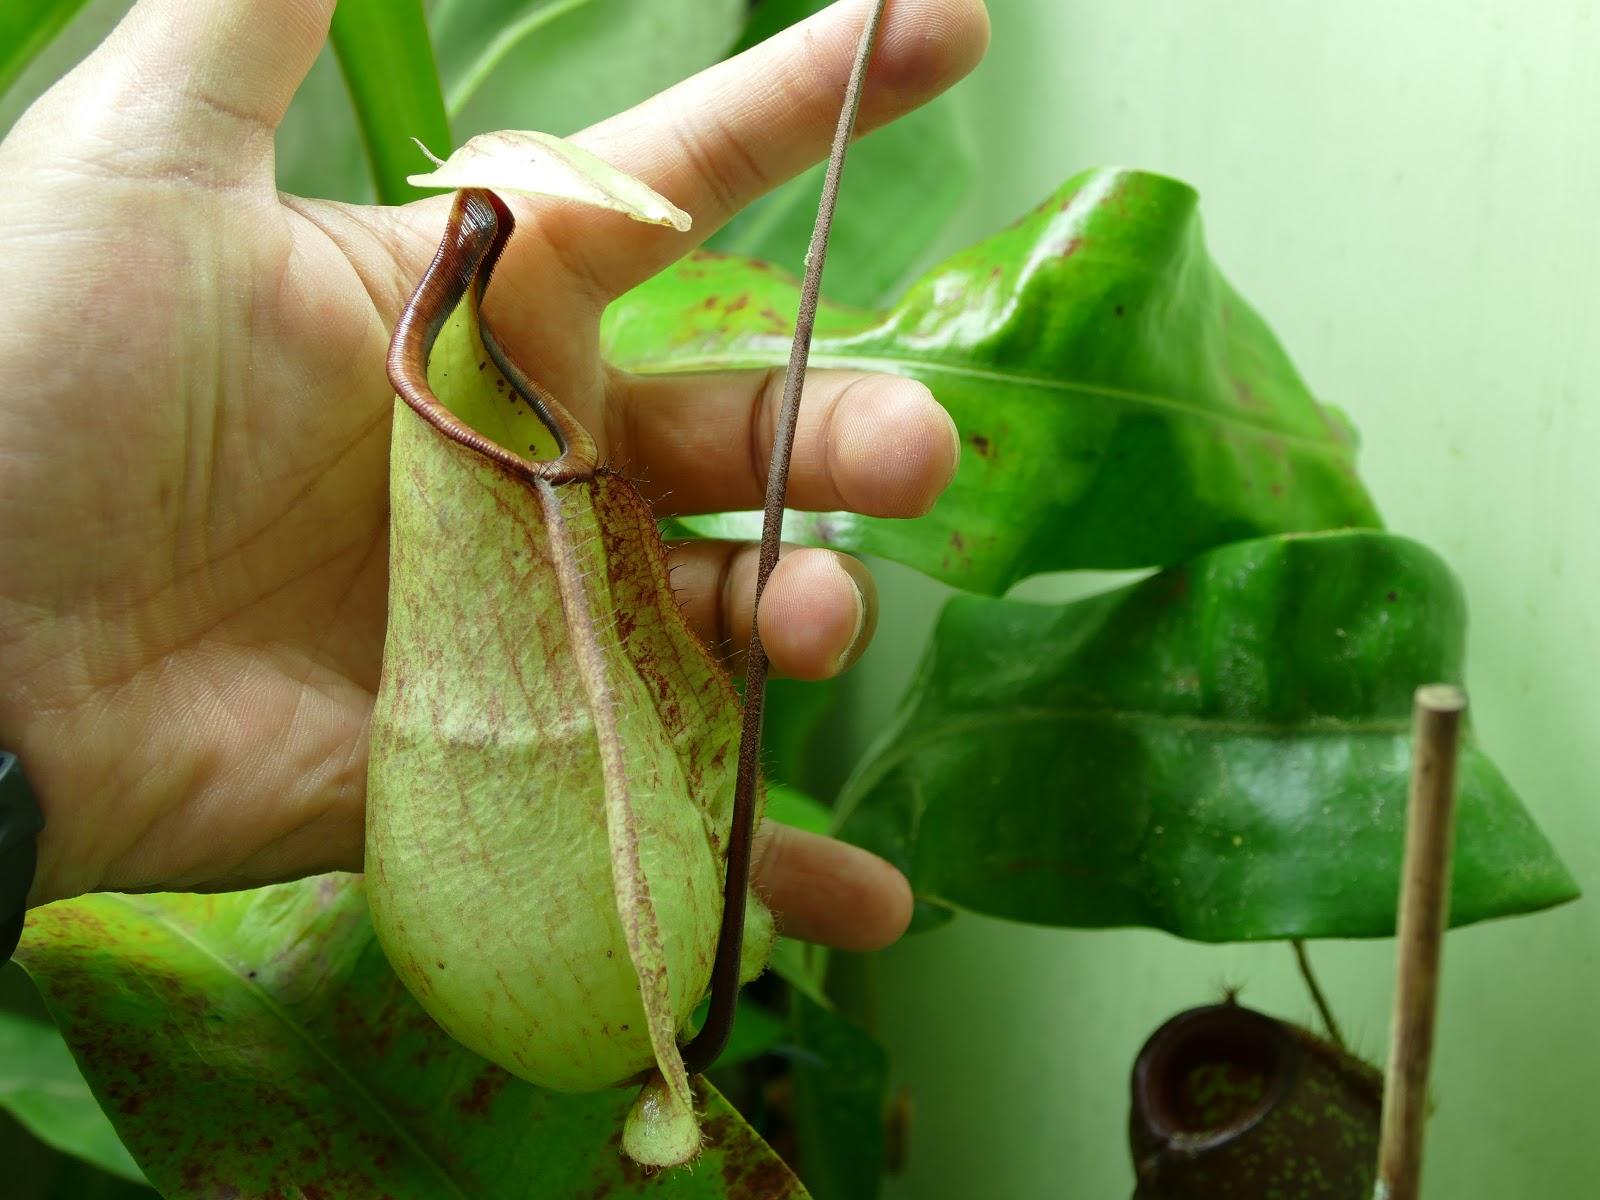 Nepenthes rafflesiana photos 1600x1200